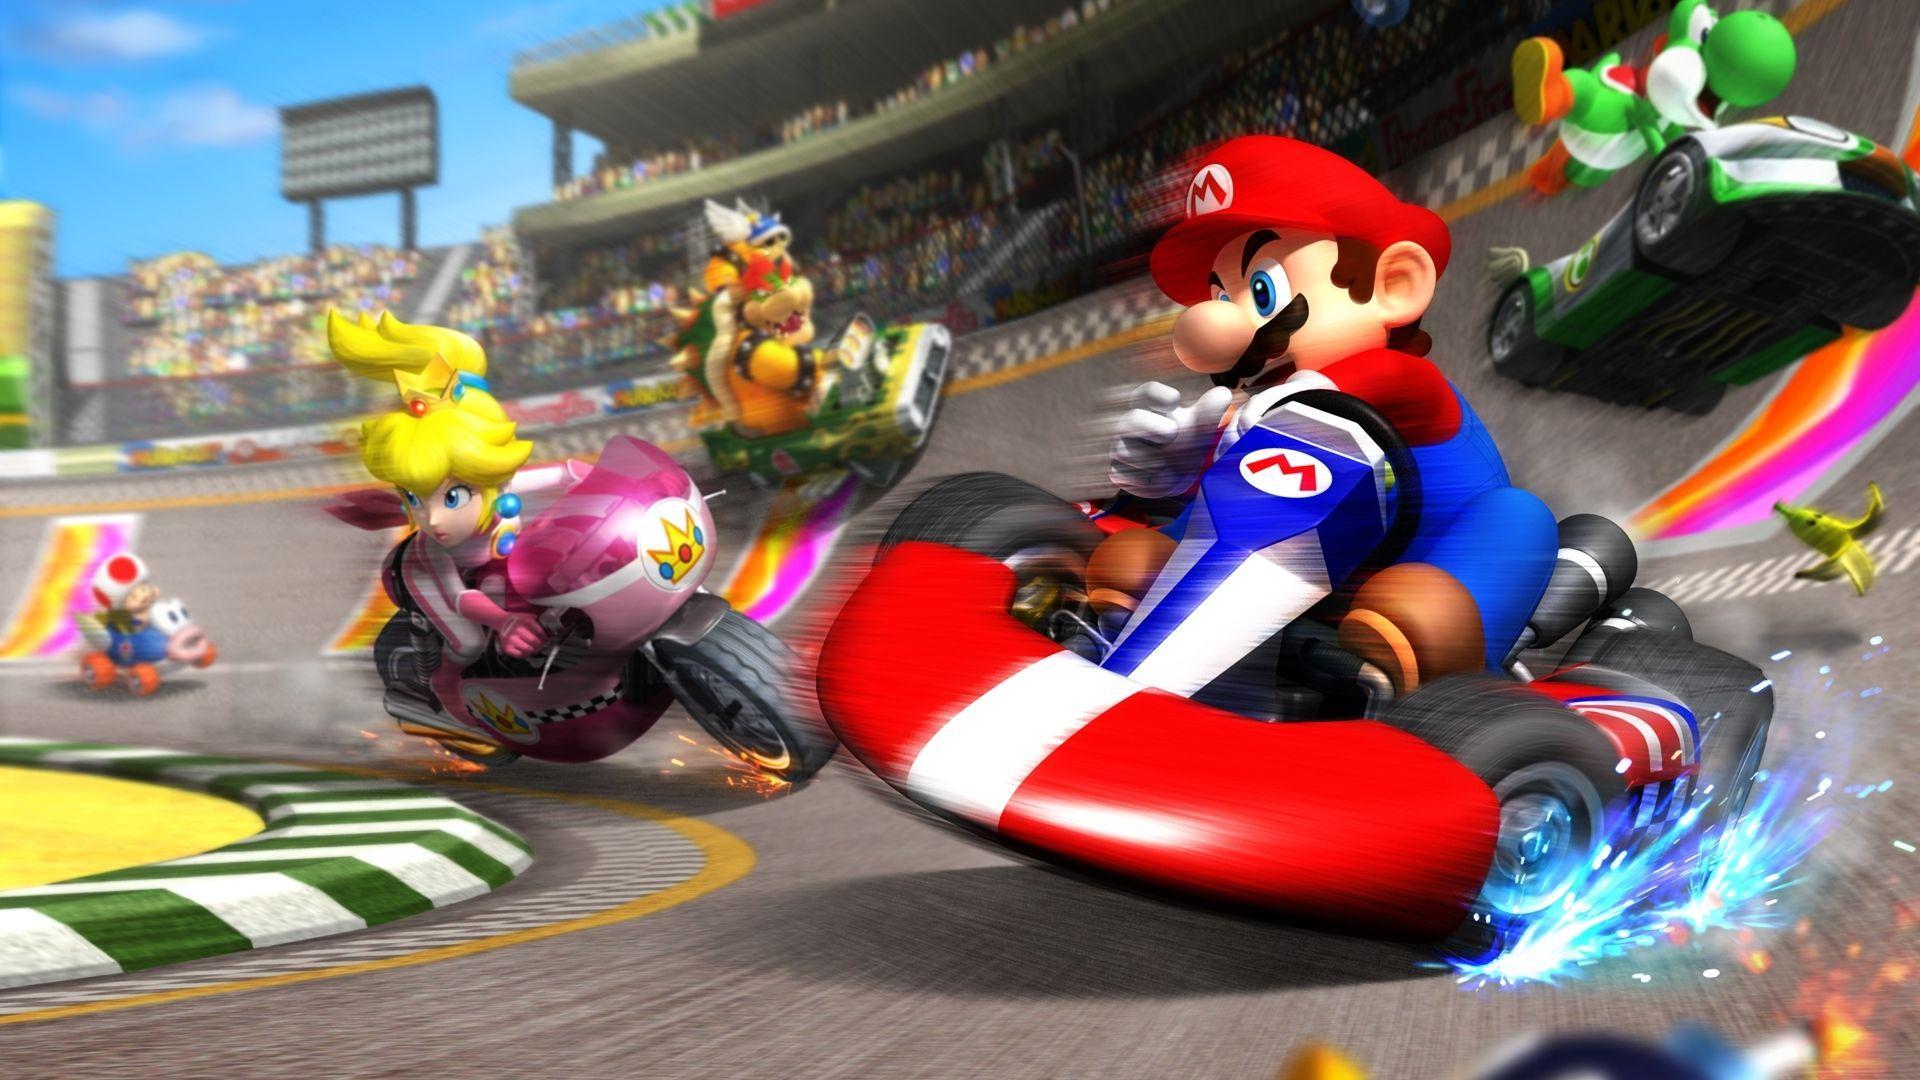 Mario Wallpapers Top Free Mario Backgrounds Wallpaperaccess